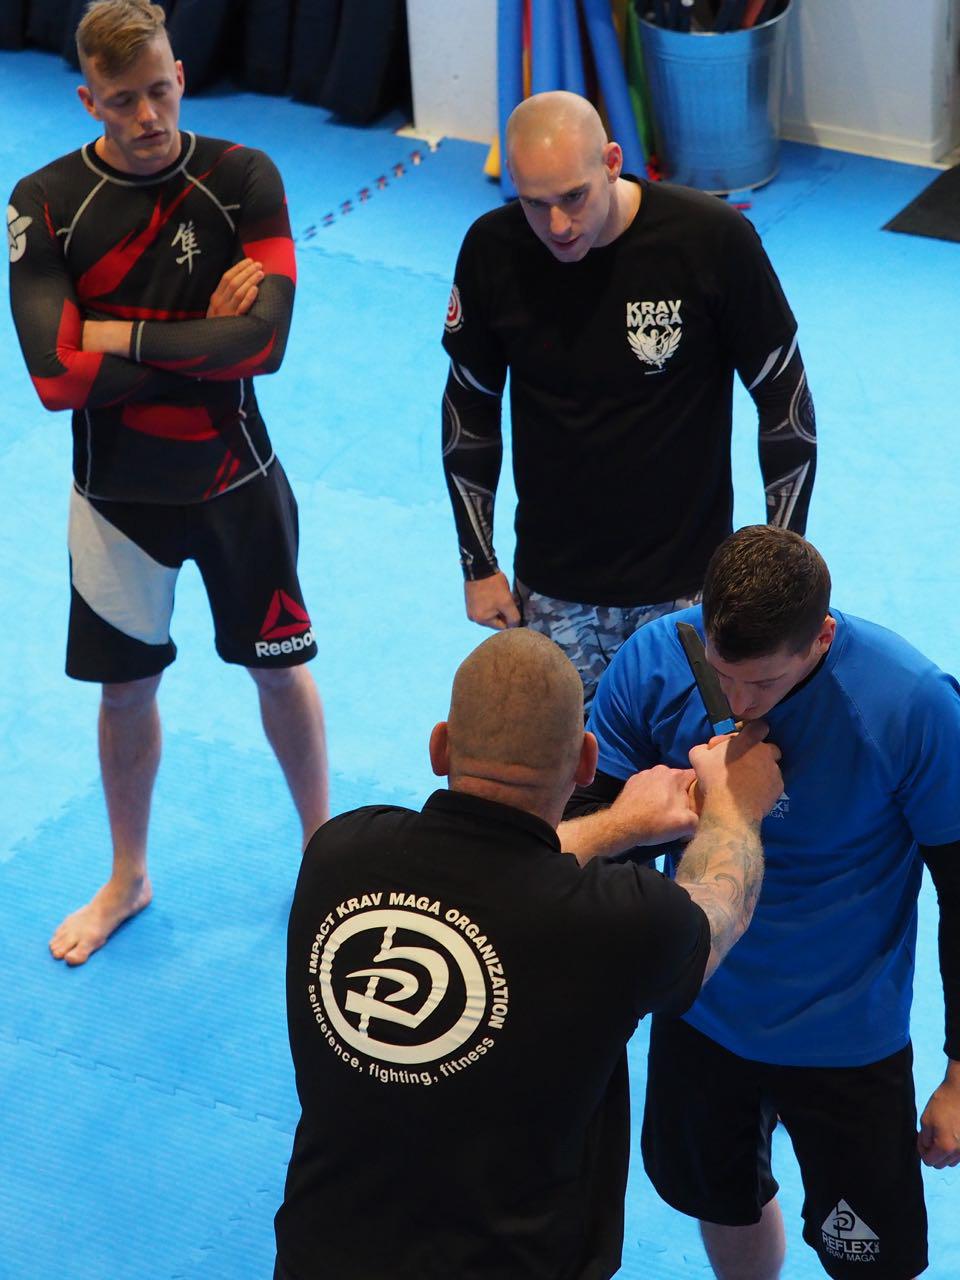 Krav Maga trainer opleiding REFLEX Utrecht